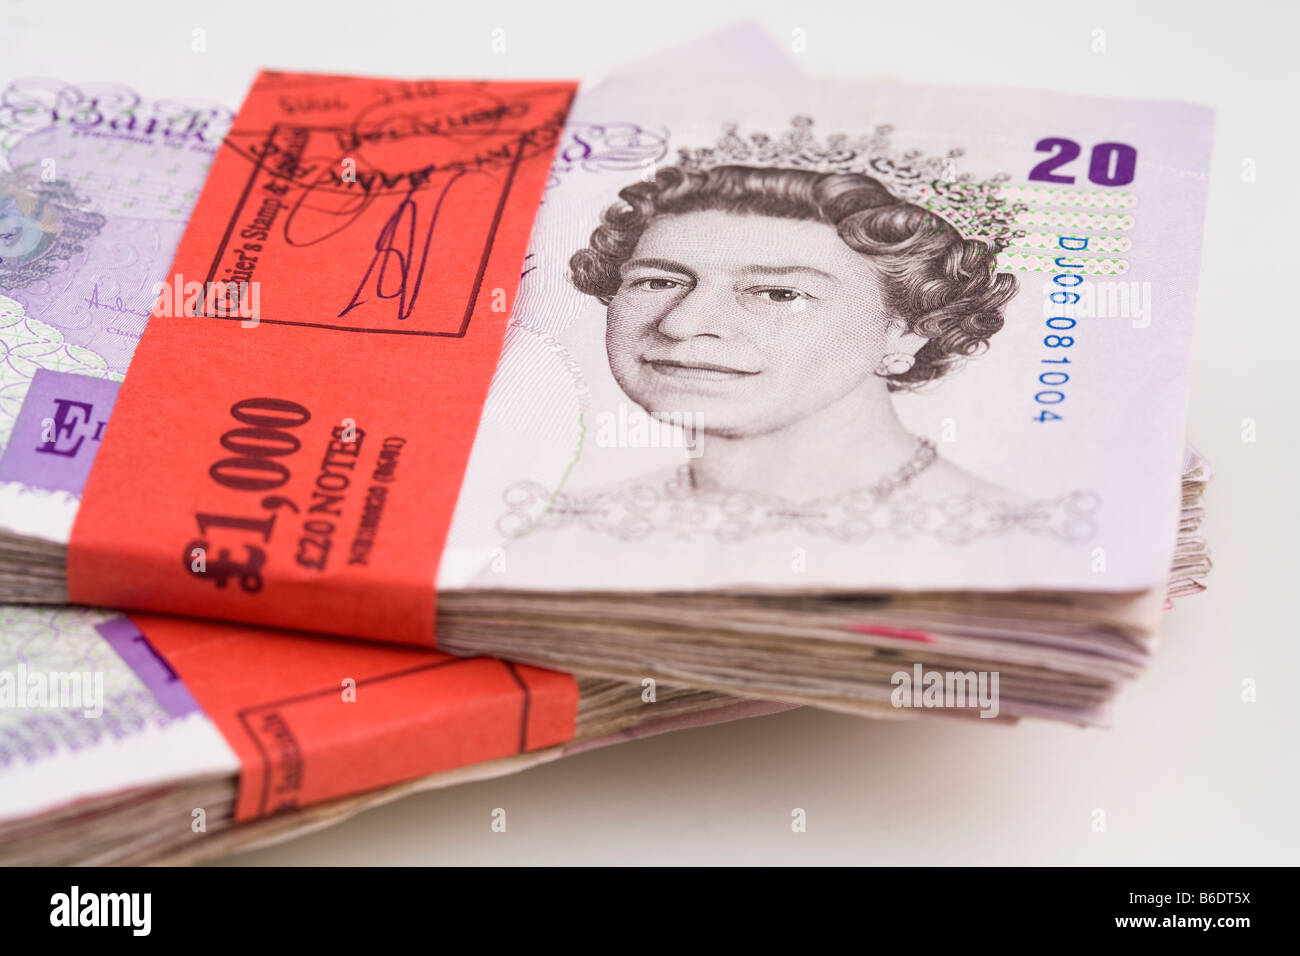 One thousand English pounds - Stock Image